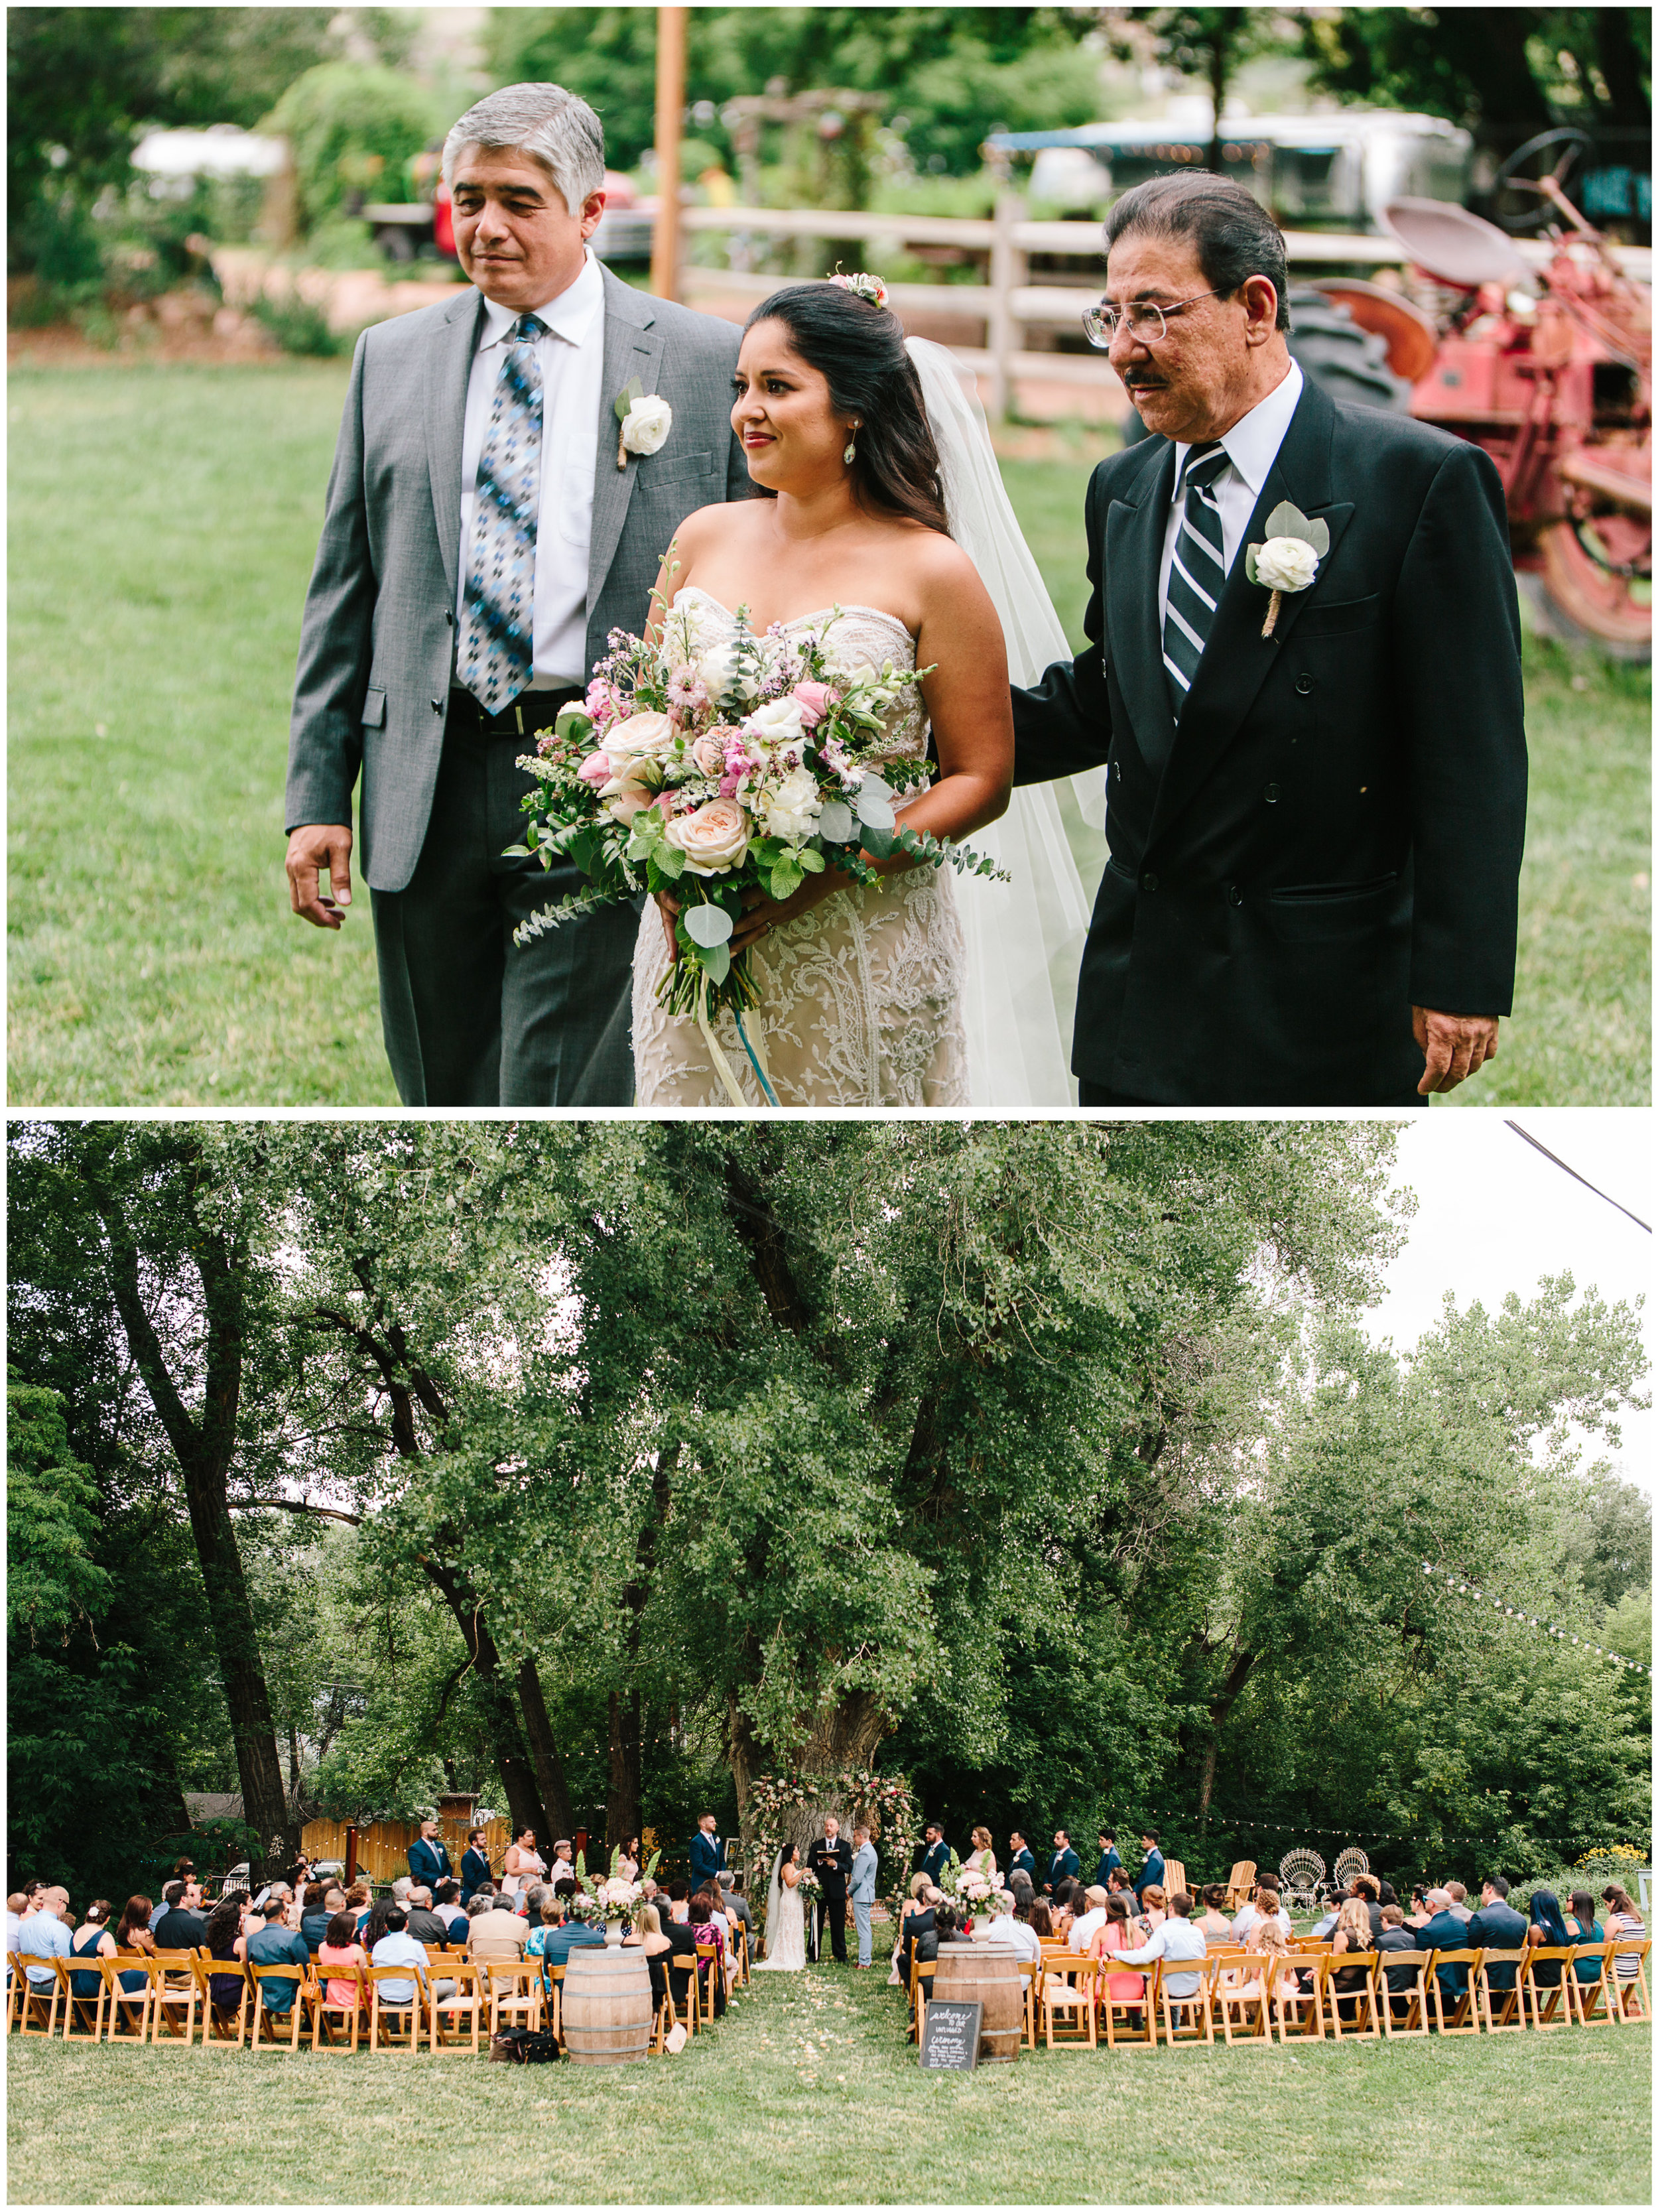 lyons_farmette_wedding_23.jpg